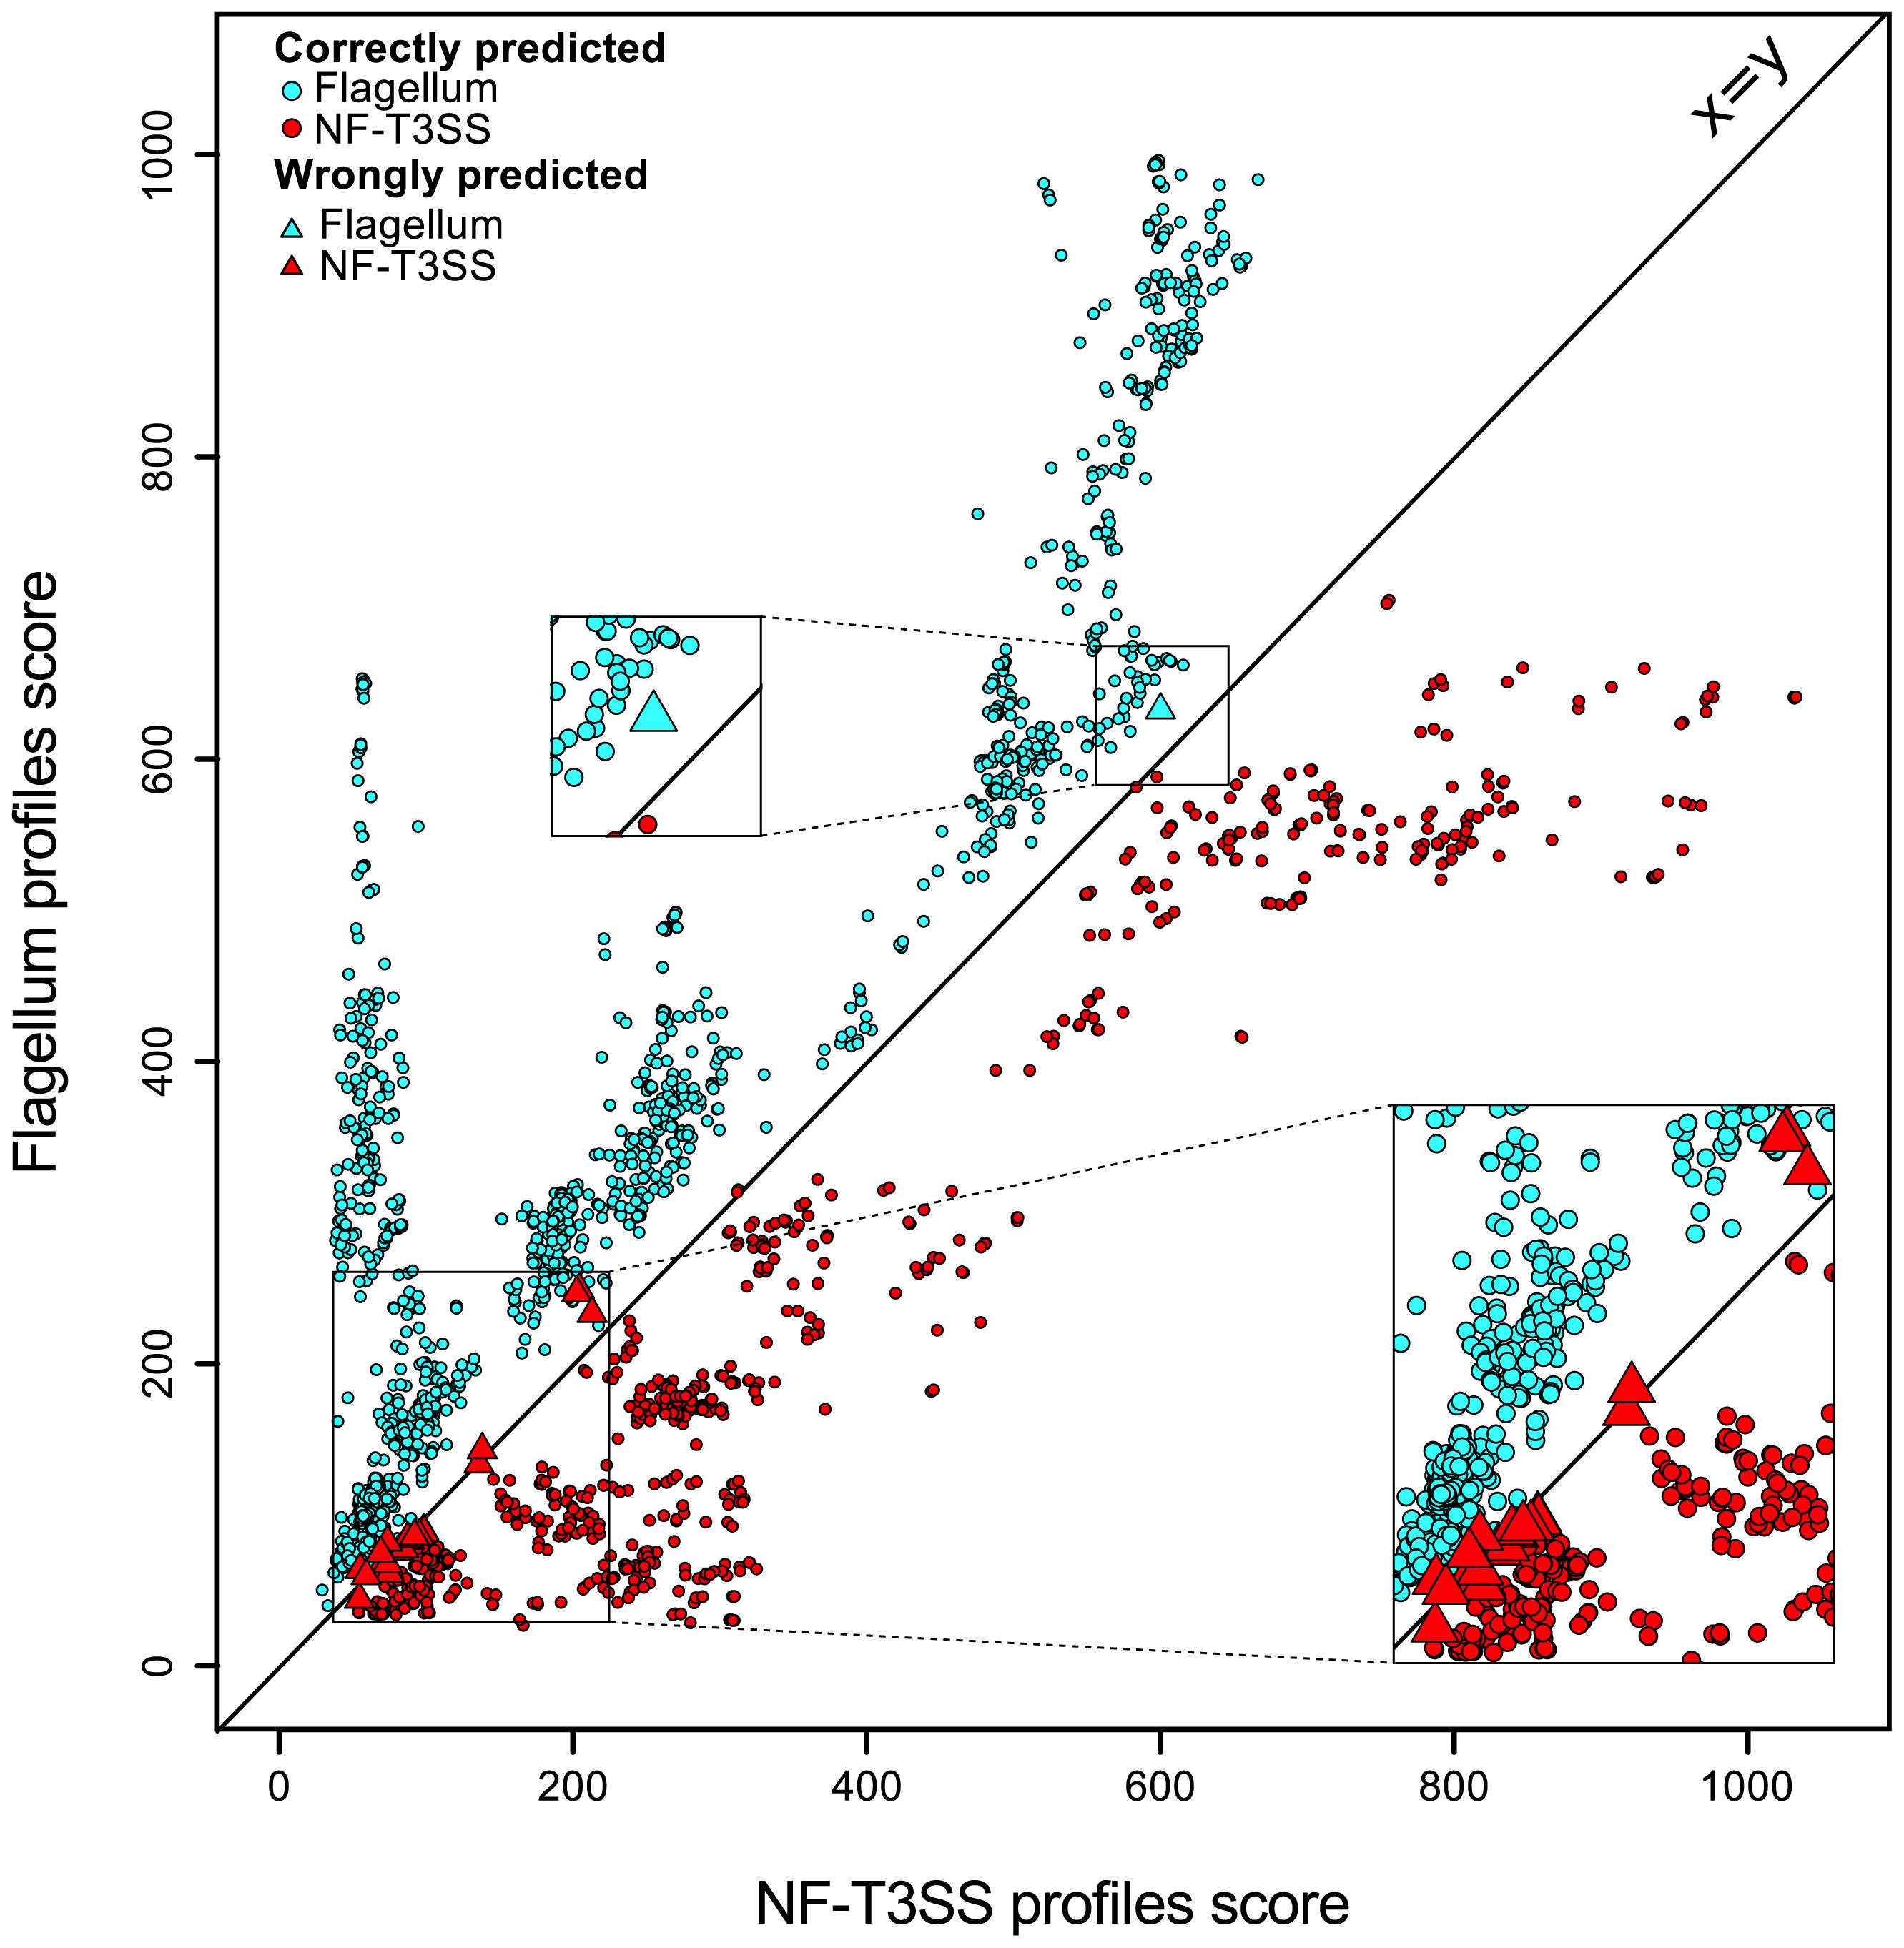 Discrimination between NF-T3SSs and flagella based on Hmmer profile scores.